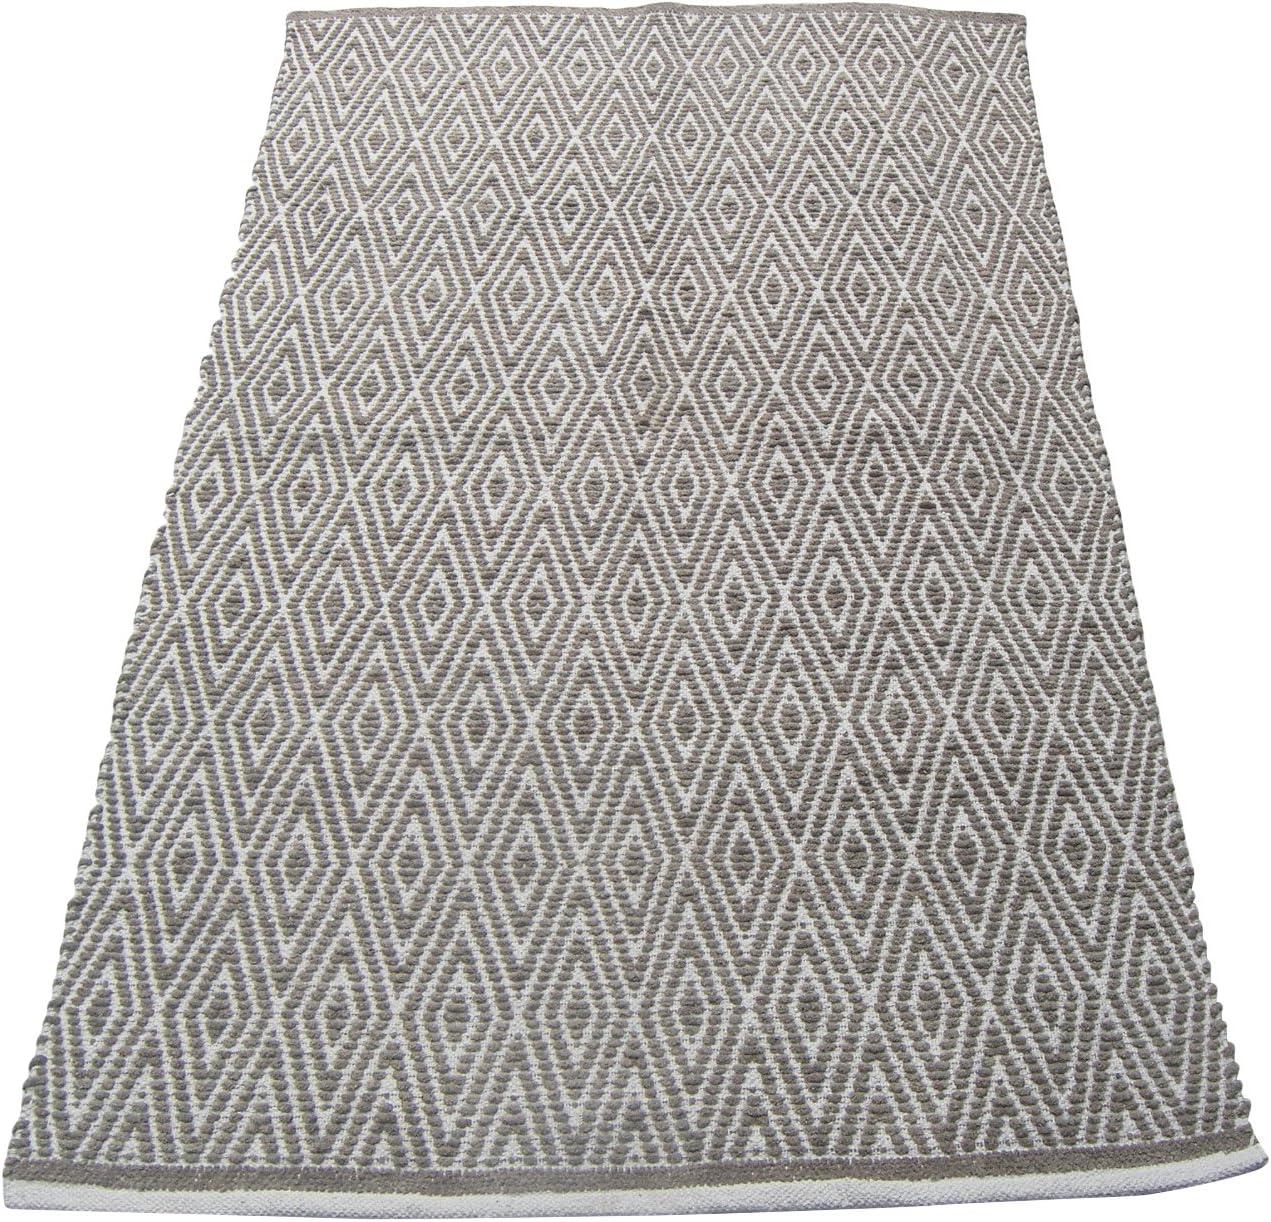 Safavieh Vintage Collection VTG117-330 Oriental Distressed Silky Viscose Area Rug, 2 7 x 4 , Soft Anthracite